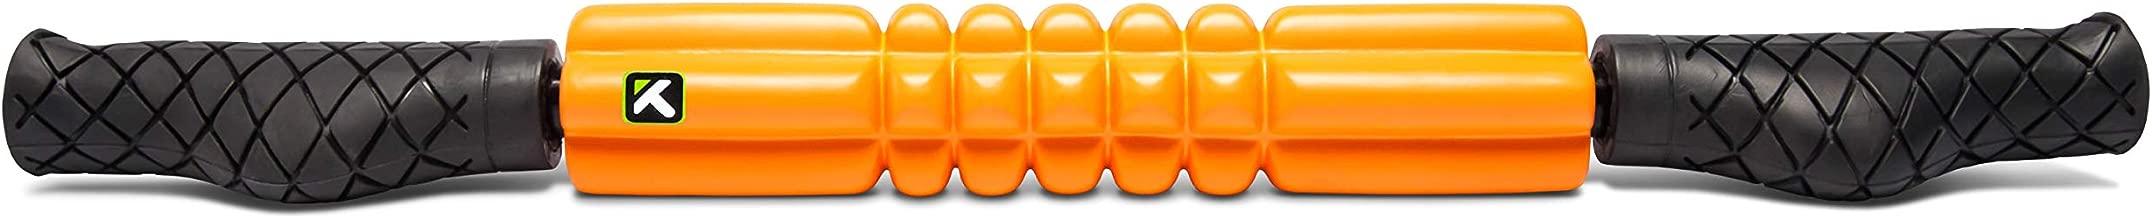 Massagestab f/ür Eigenmassage Faszien Roller 43 cm lang Travel-Stick